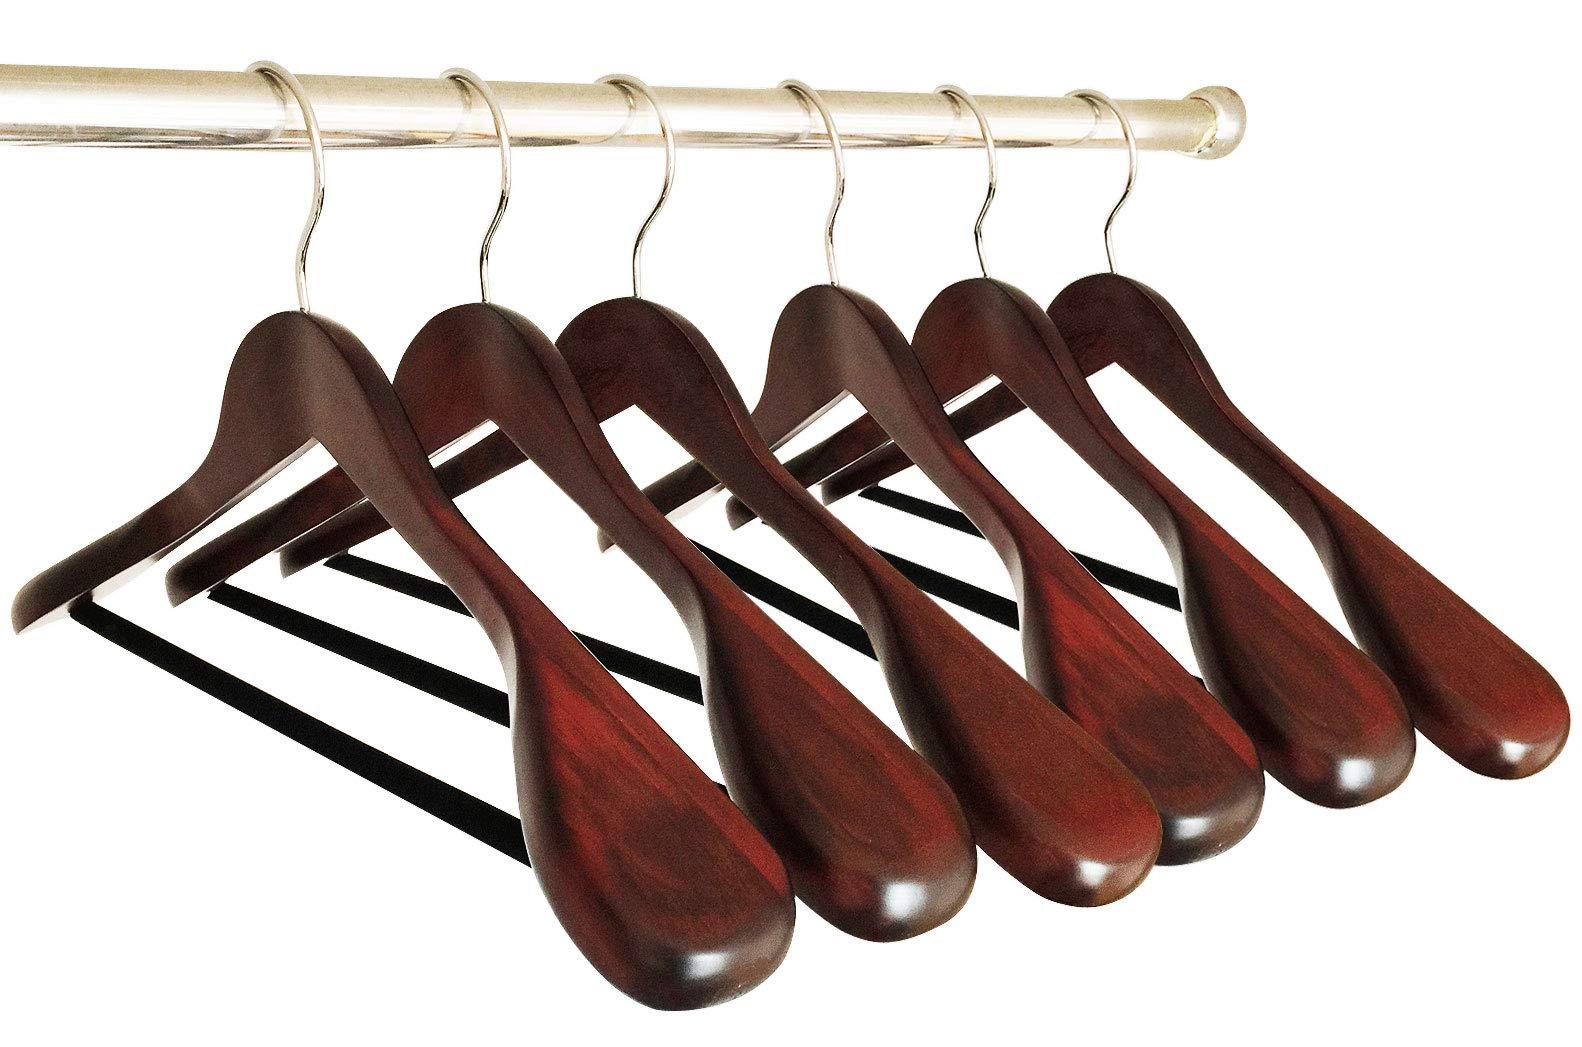 B&C Home Goods Set of 6 Luxury Wooden Hangers - Extra Wide Wood Coat Suit Hangers with Velvet Bar for Coats Clothes and Pants - Wide Shoulder